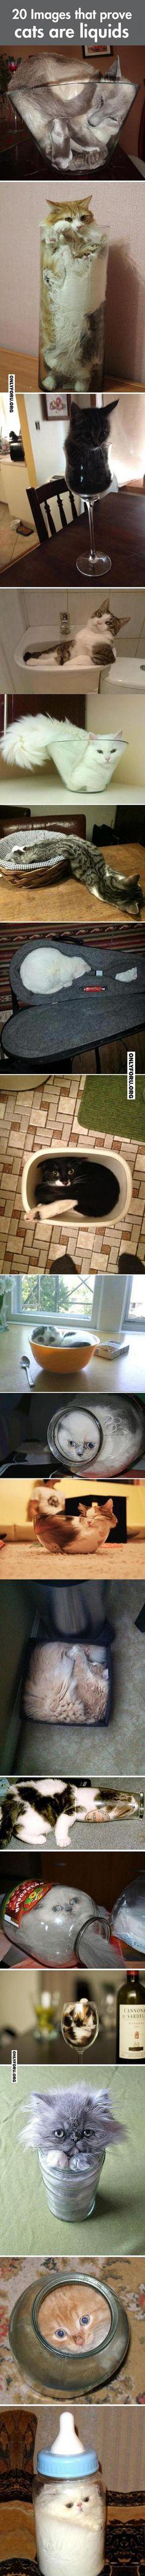 Some images that prove cats are liquids - #OnlyForU, #funny, #lol, #fun, #humor, #rofl, #gif, #troll, #comics, #meme, #gags, #new, #lol pics, #lol gifs, #Funny pics, #Funny gifs,